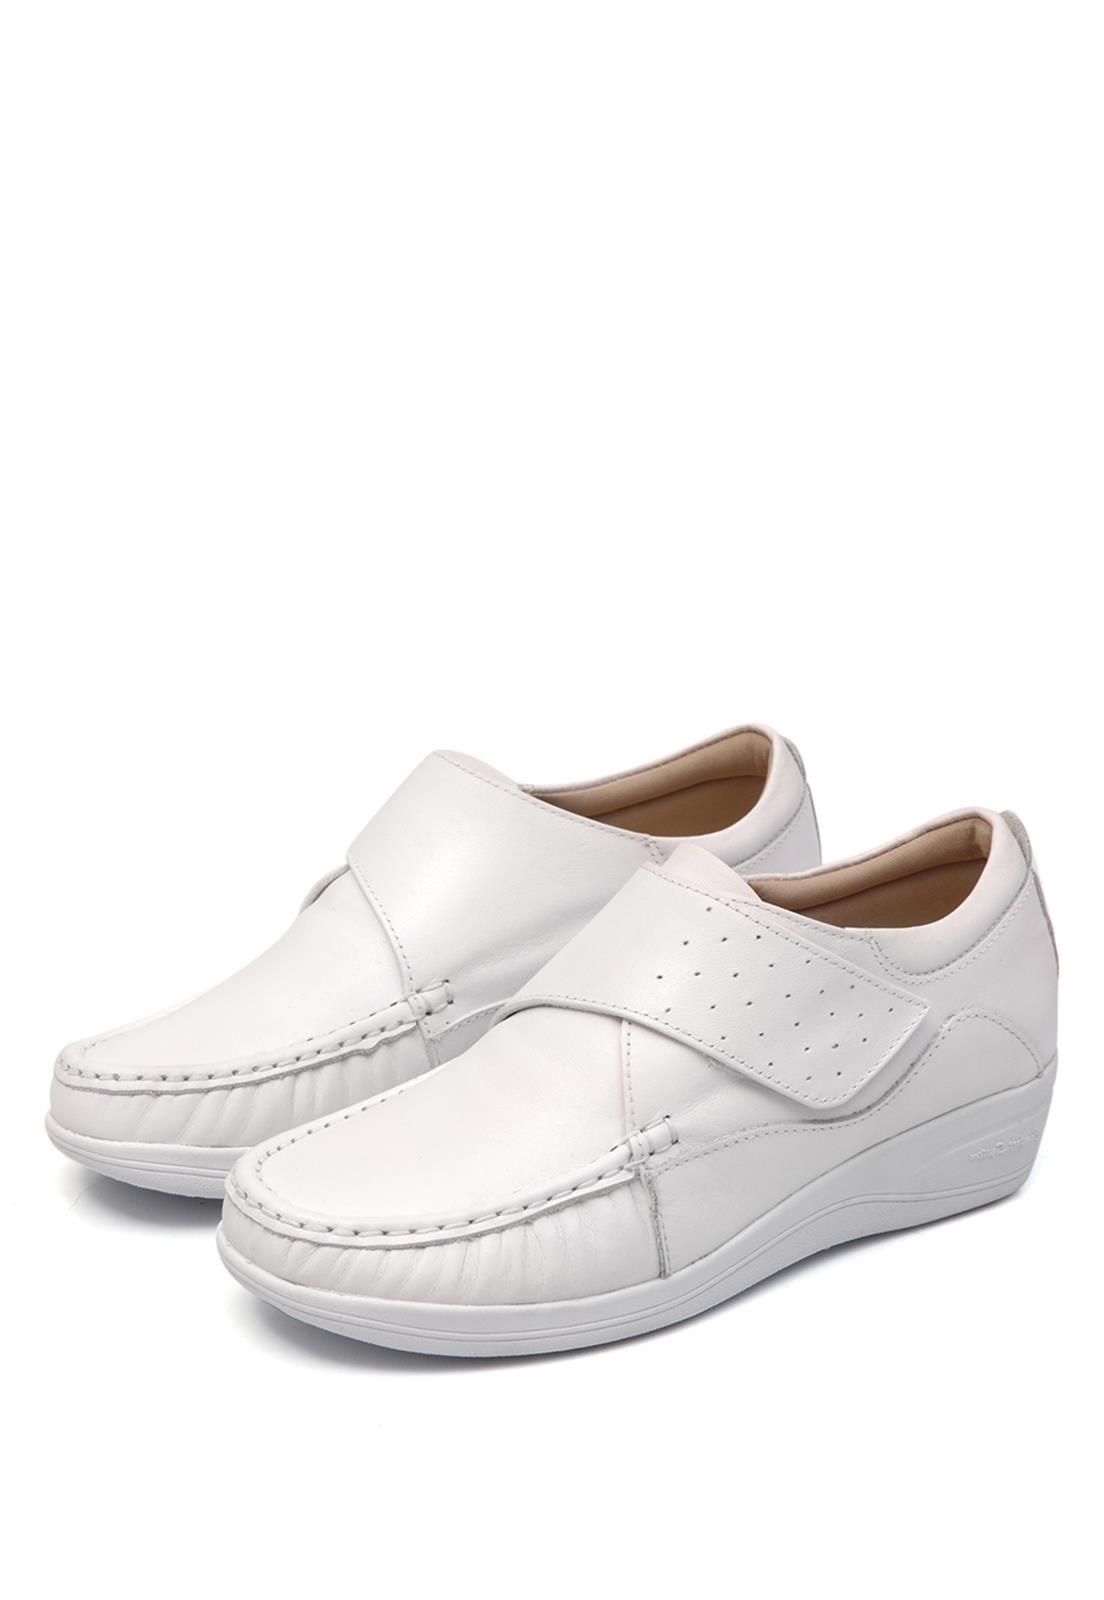 Sapato Anabela Mager 084 Napa - Cores